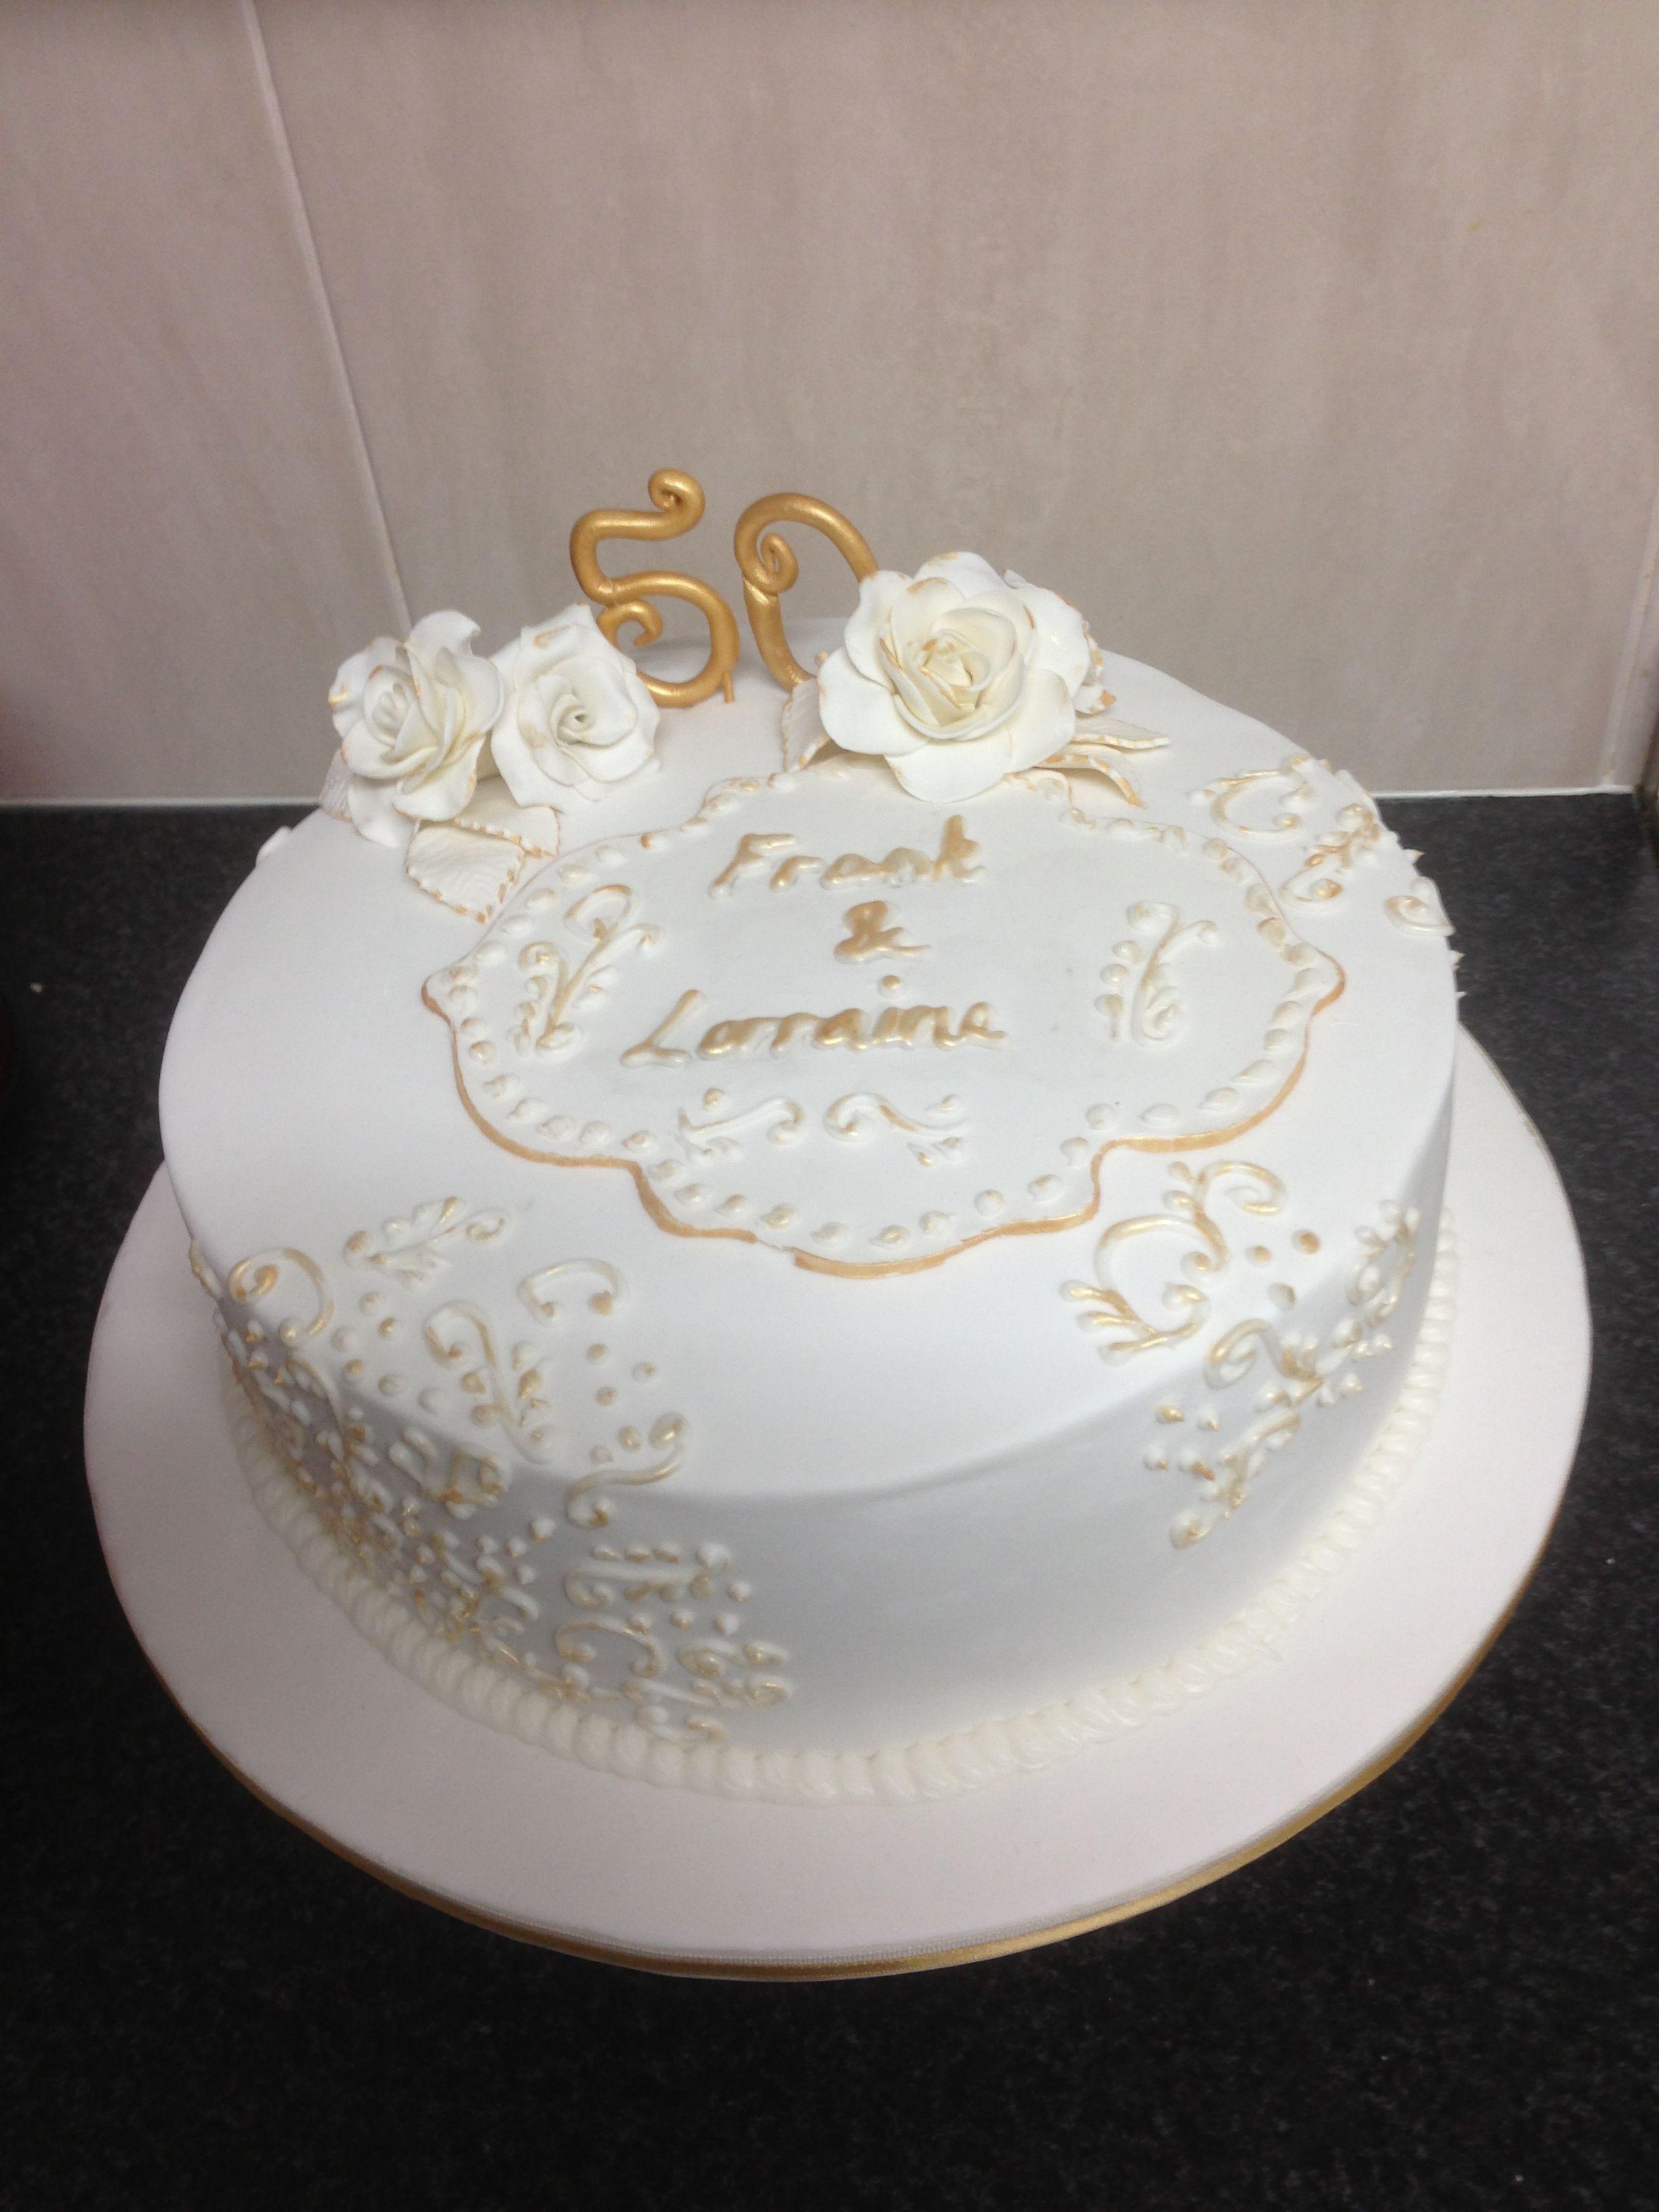 50th wedding anniversary cake   cakes   Pinterest   Wedding ...